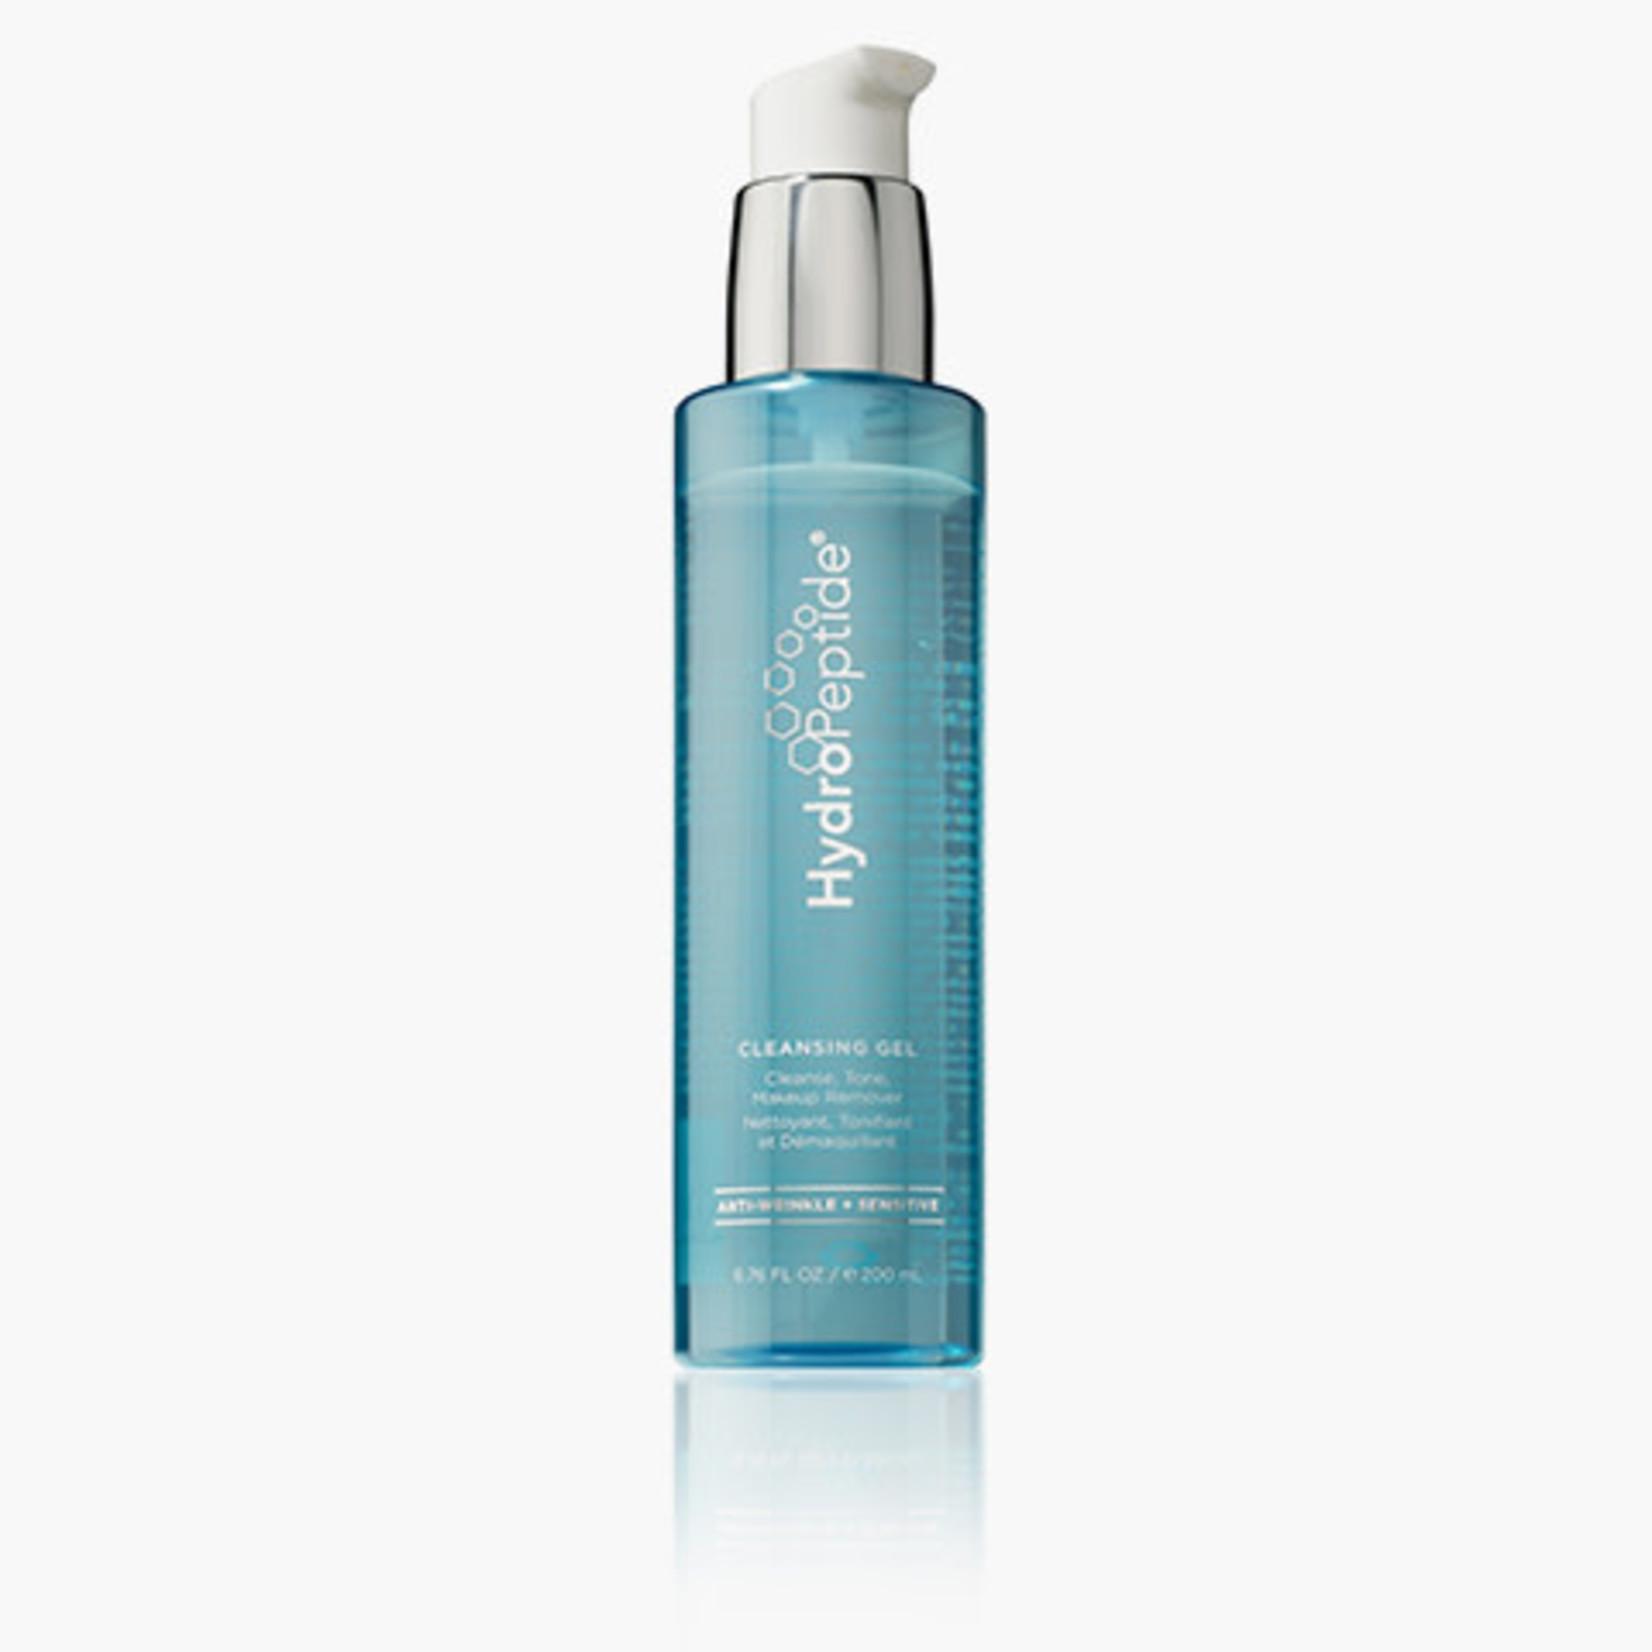 HydroPeptide Cleansing gel